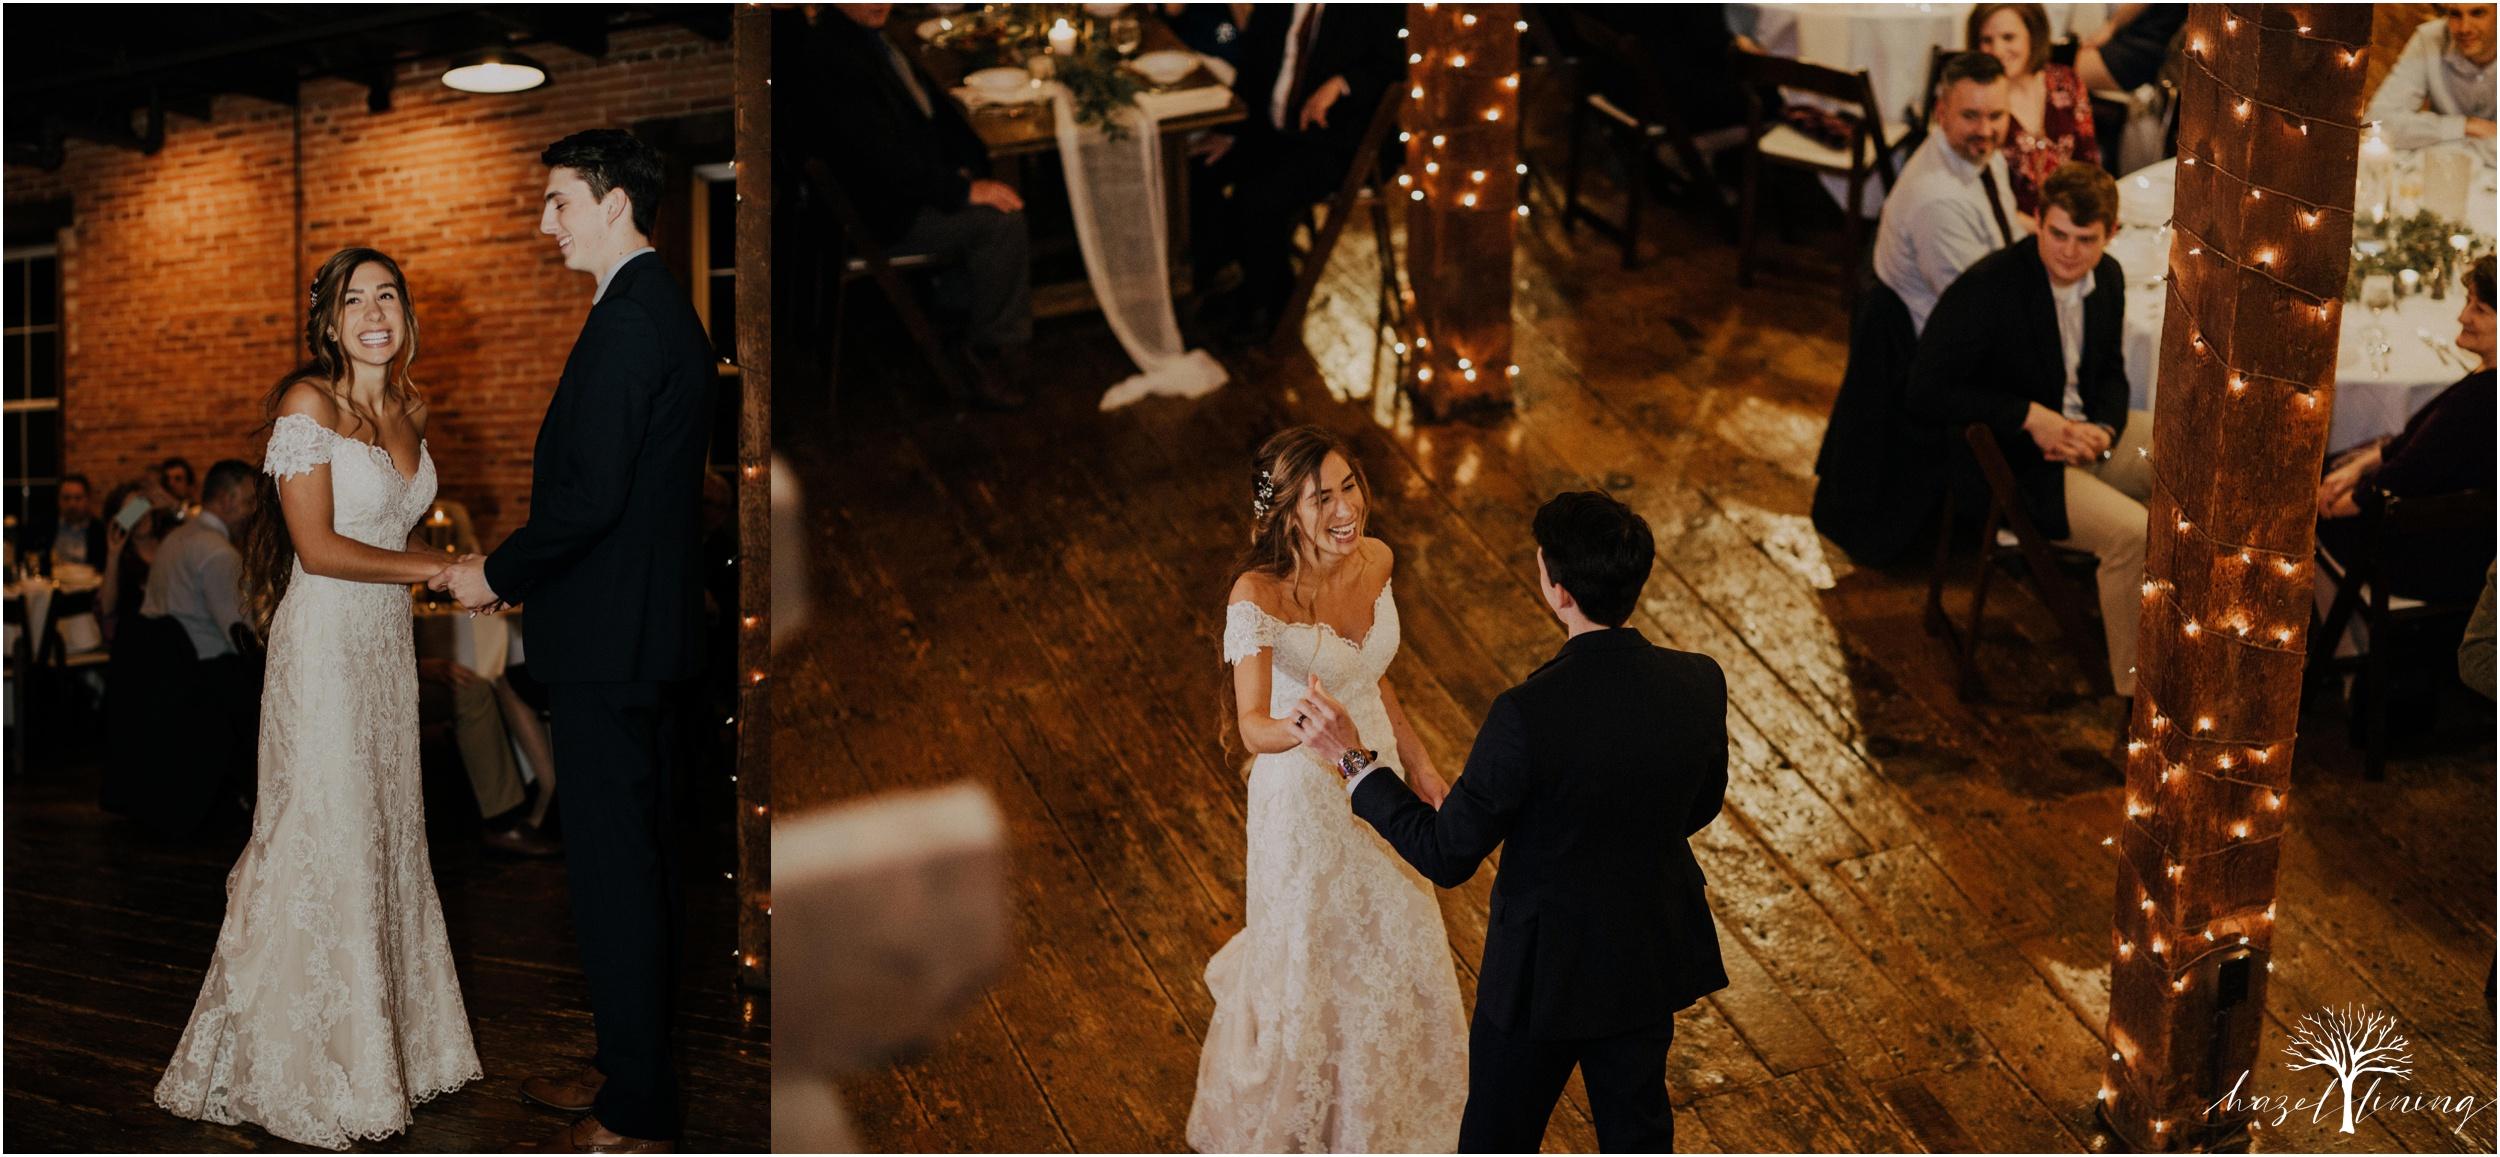 emma-matt-gehringer-the-booking-house-lancaster-manhiem-pennsylvania-winter-wedding_0140.jpg